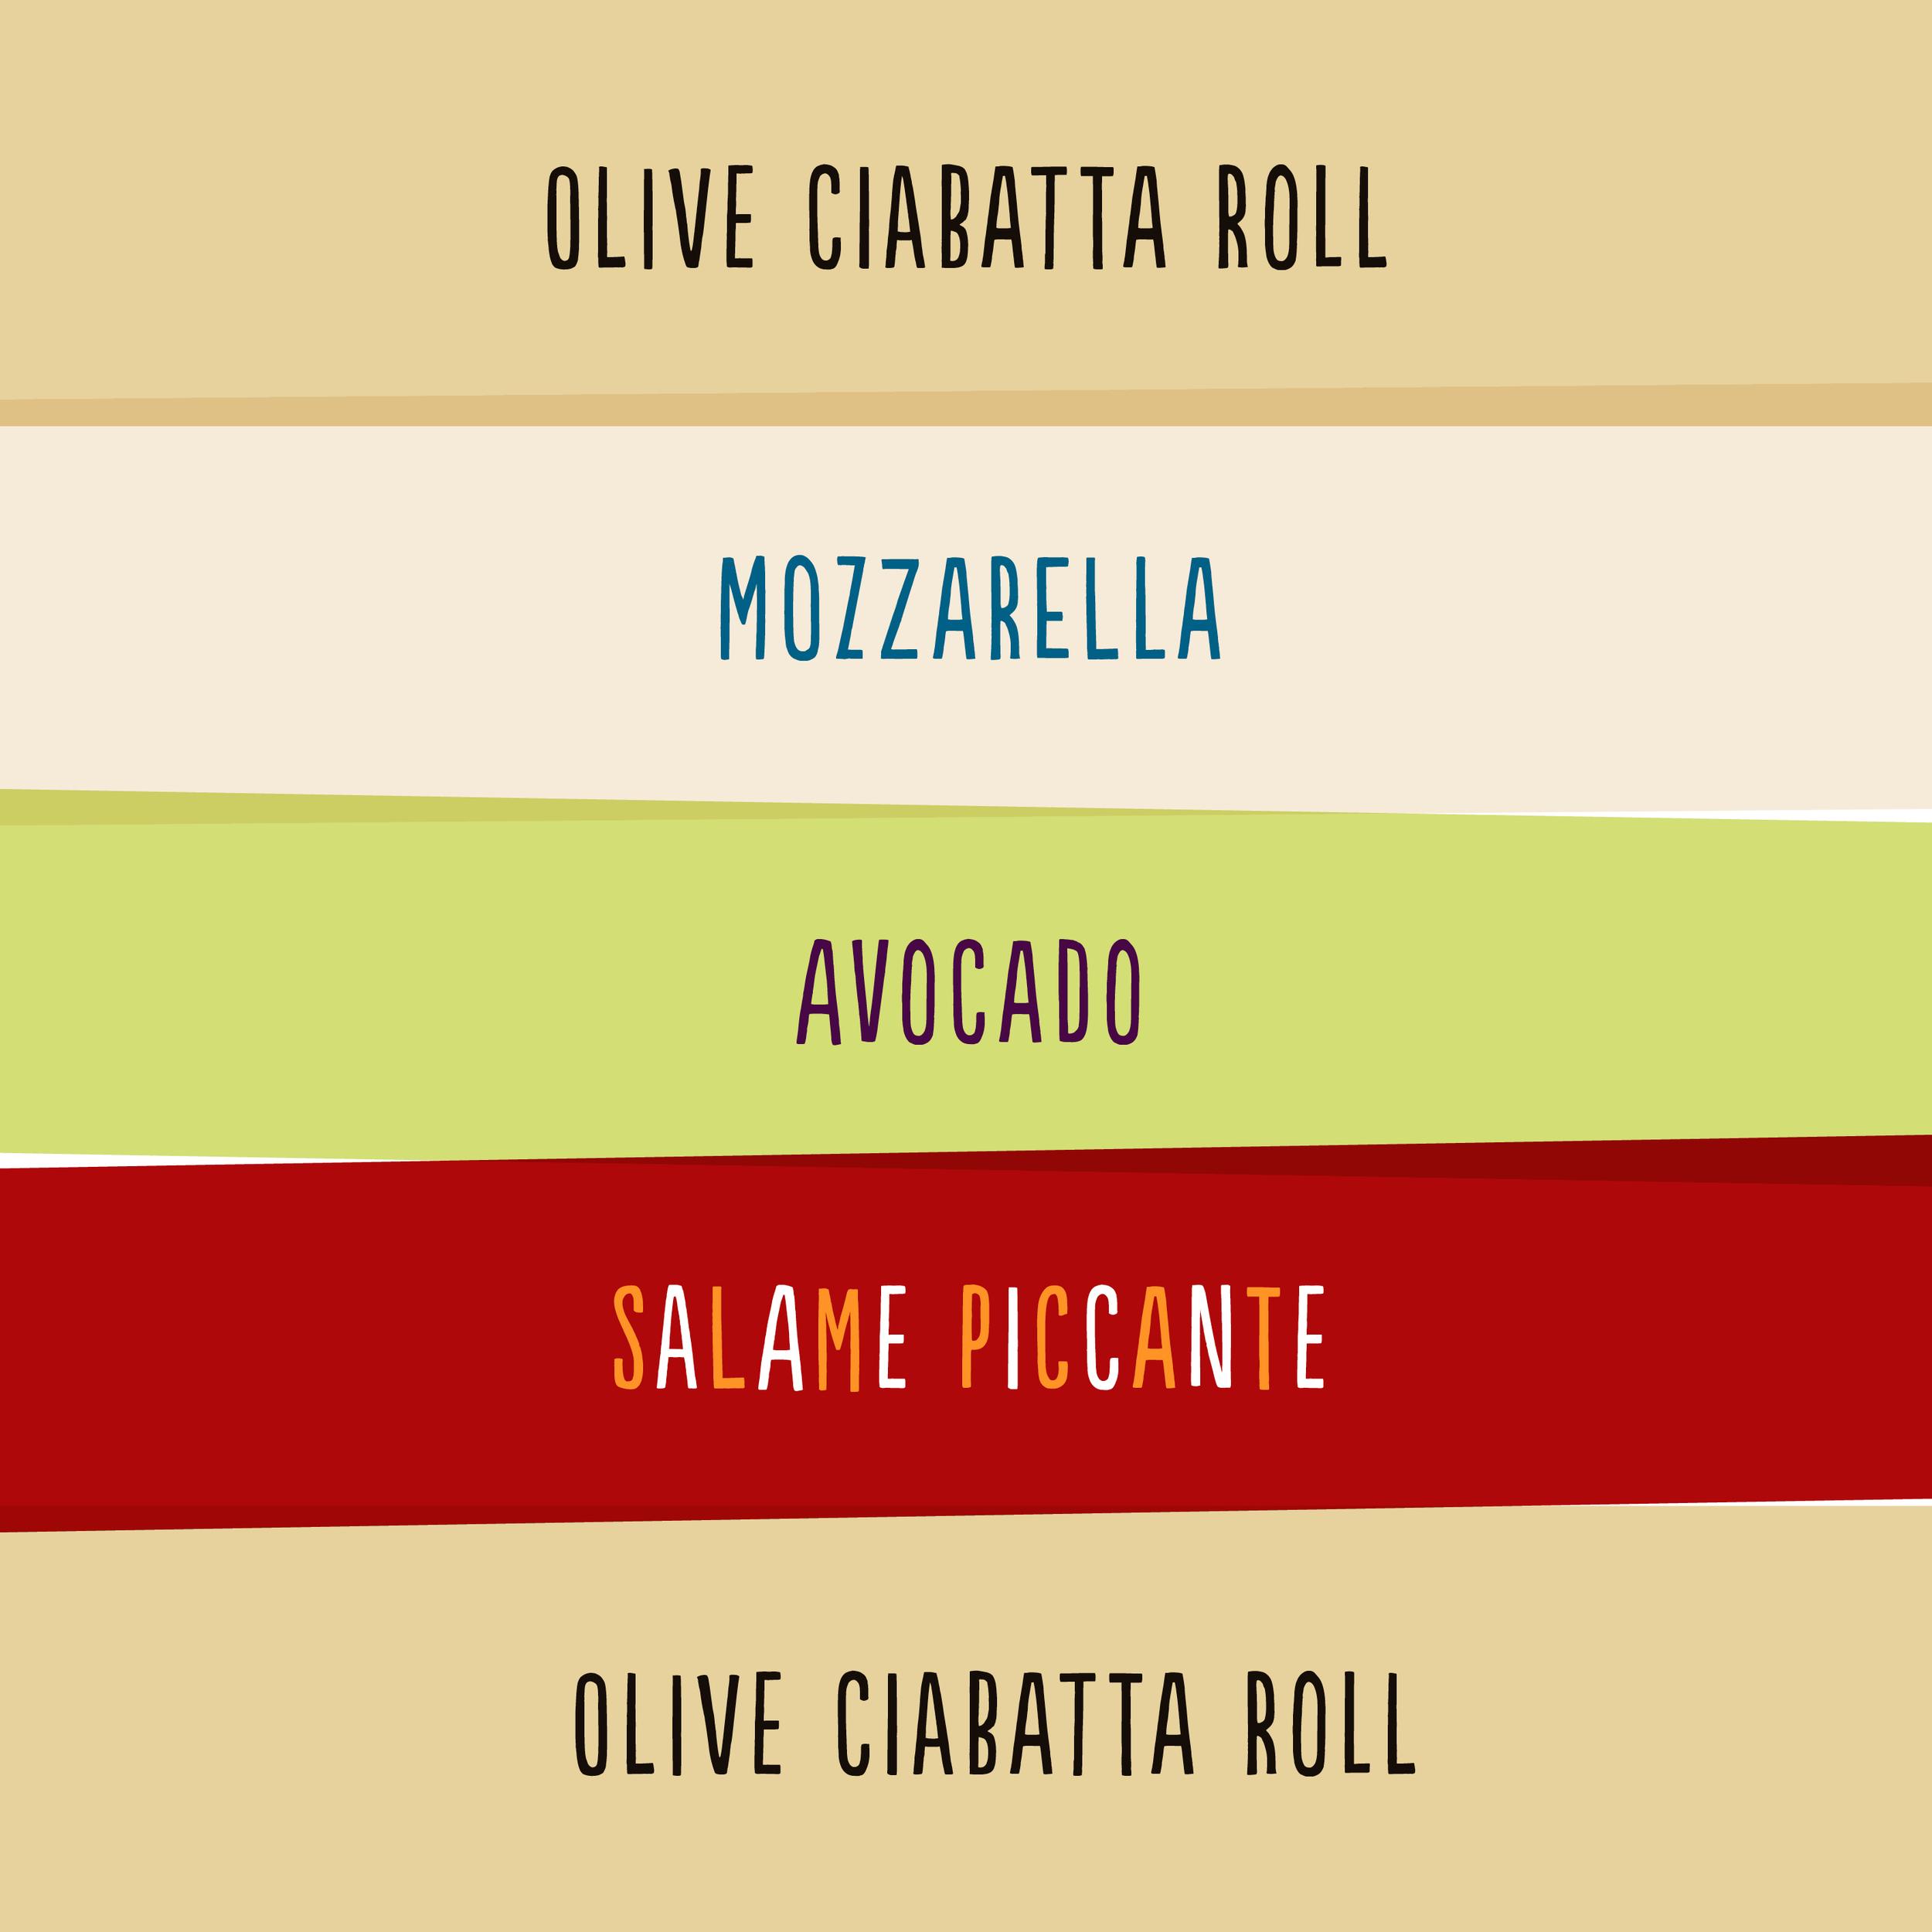 Salame-piccante-avocado-mozzarella-sandwich.jpg